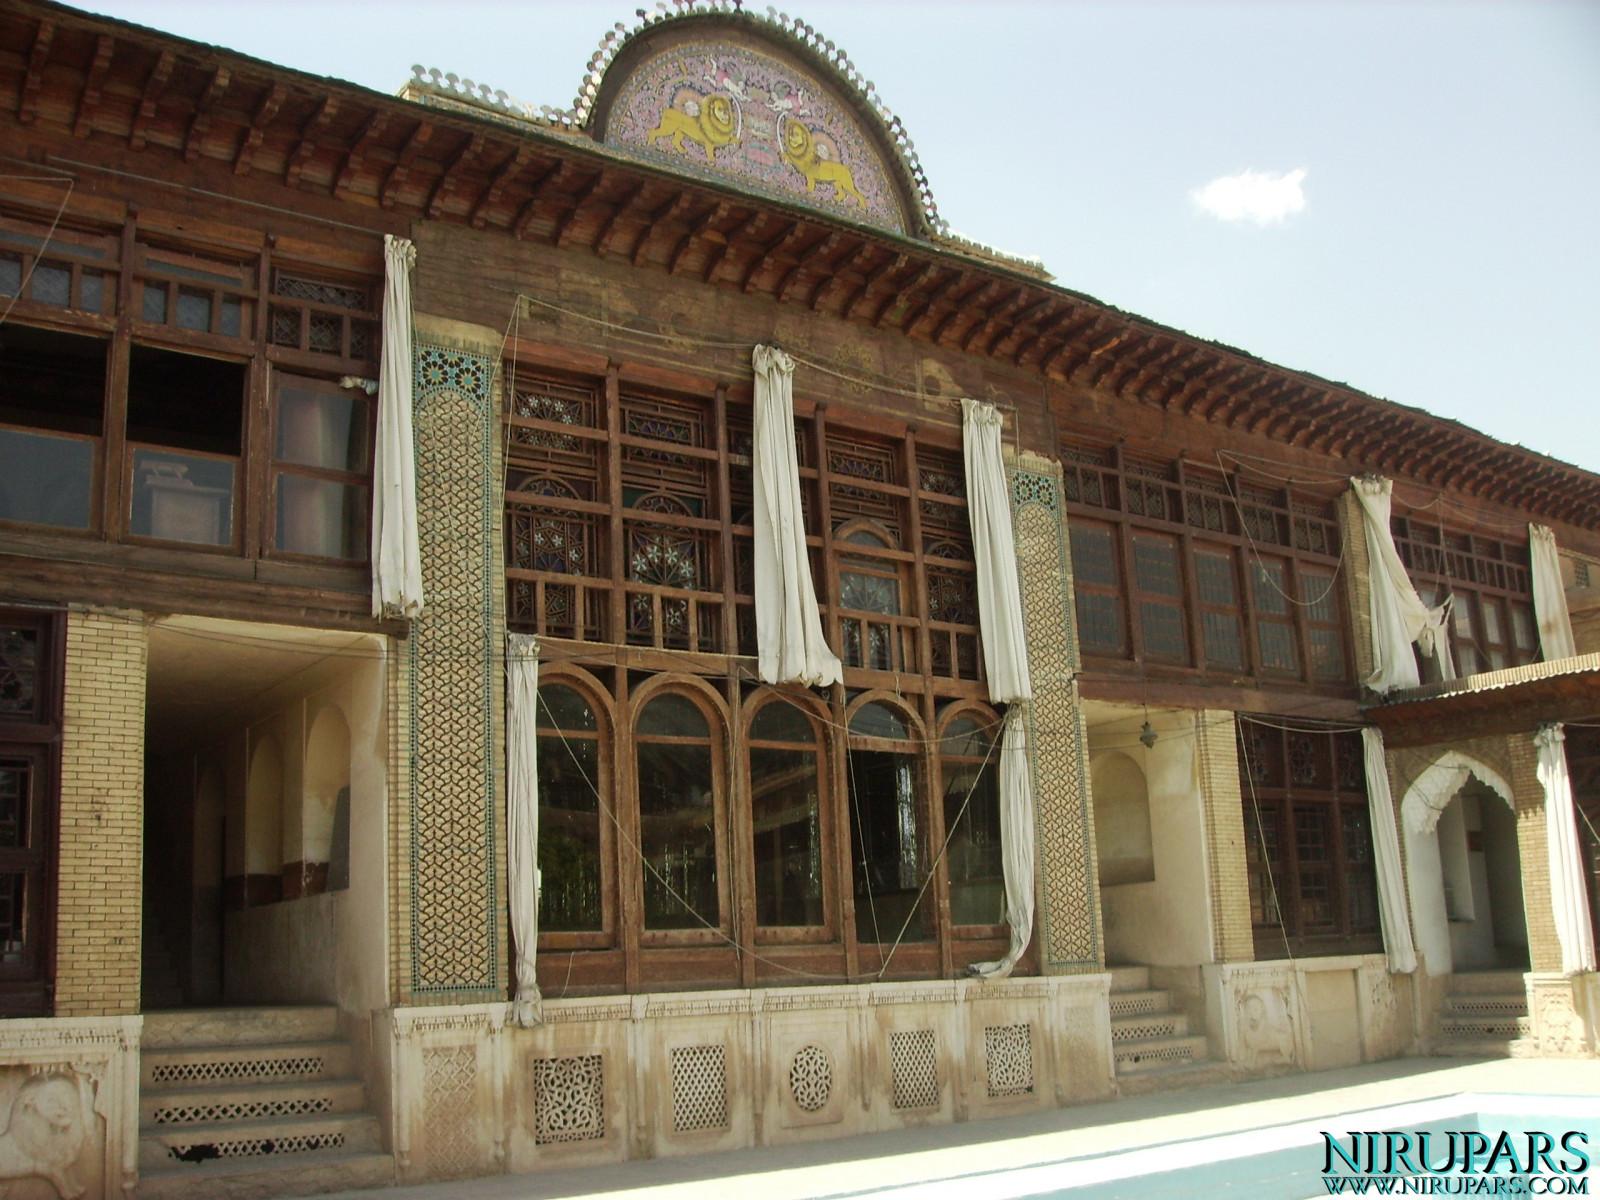 Pars History Museum - Building